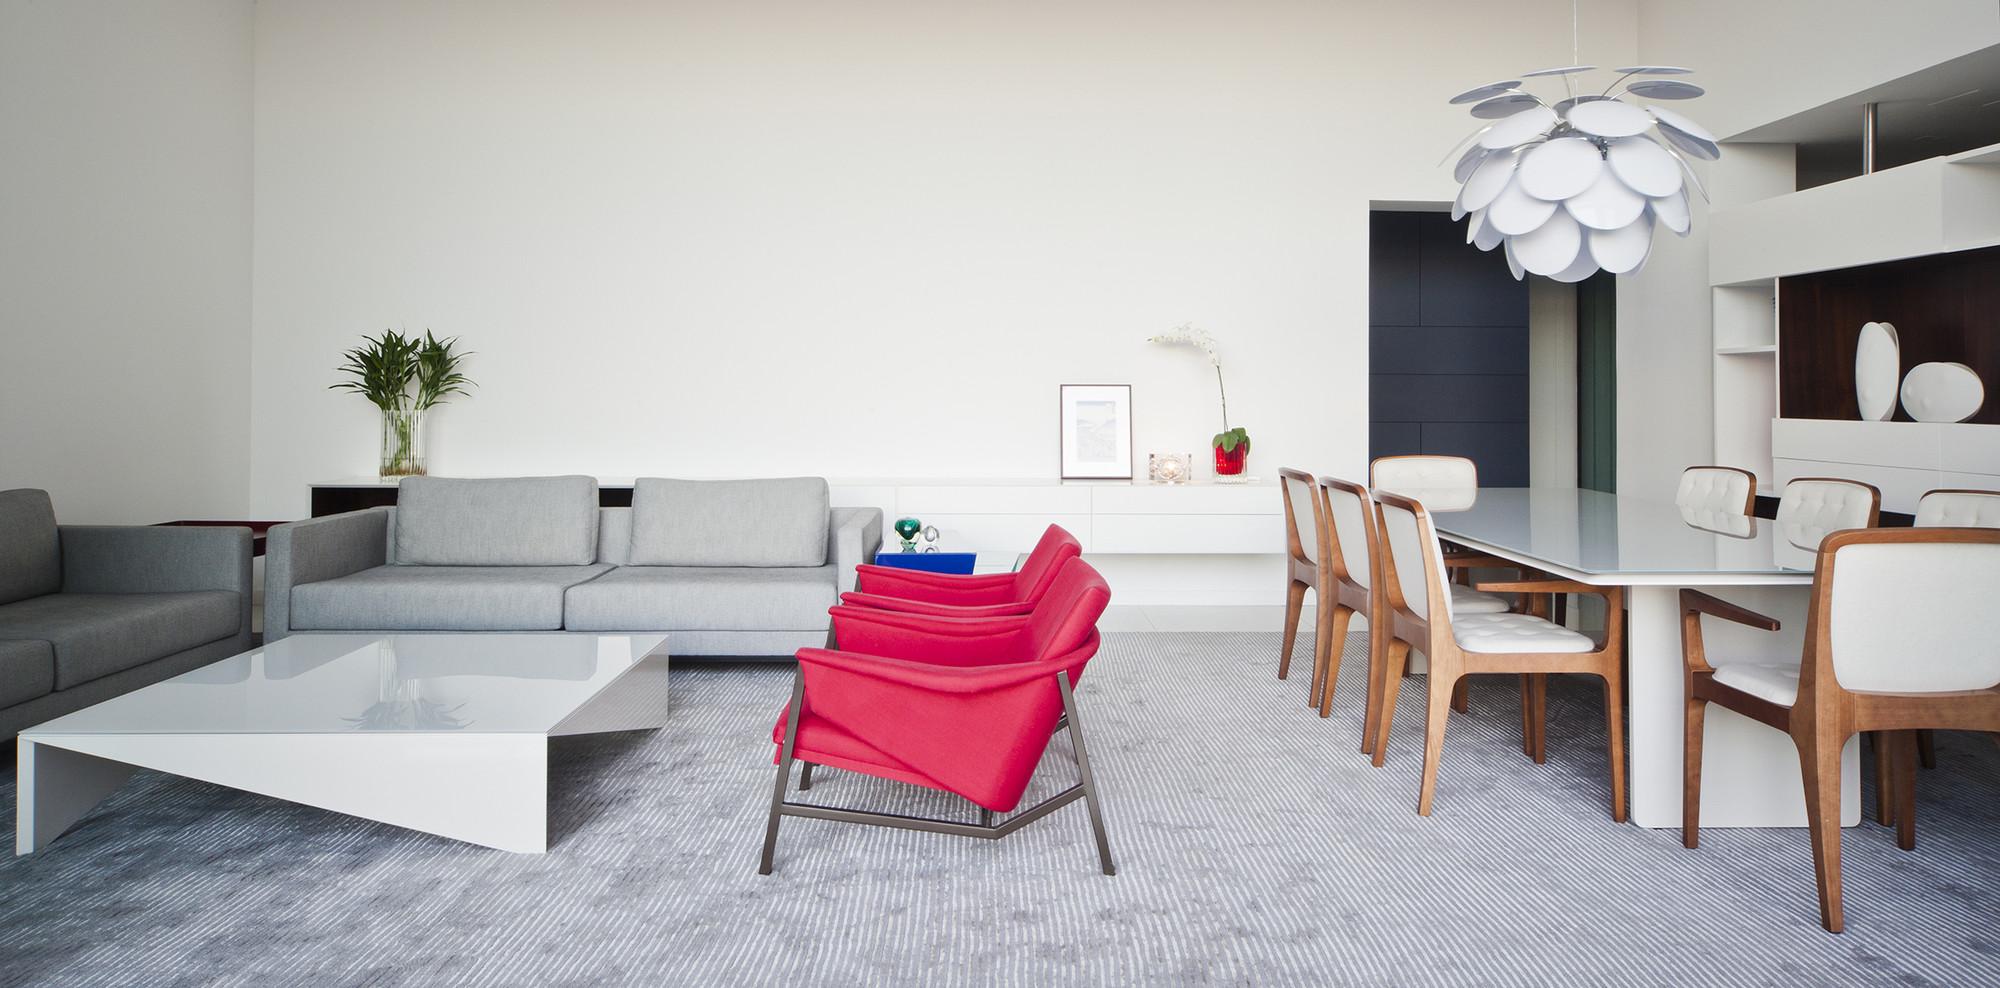 Interiores Apartamento Duo RF / Stuchi & Leite Projetos, © Maira Acayaba